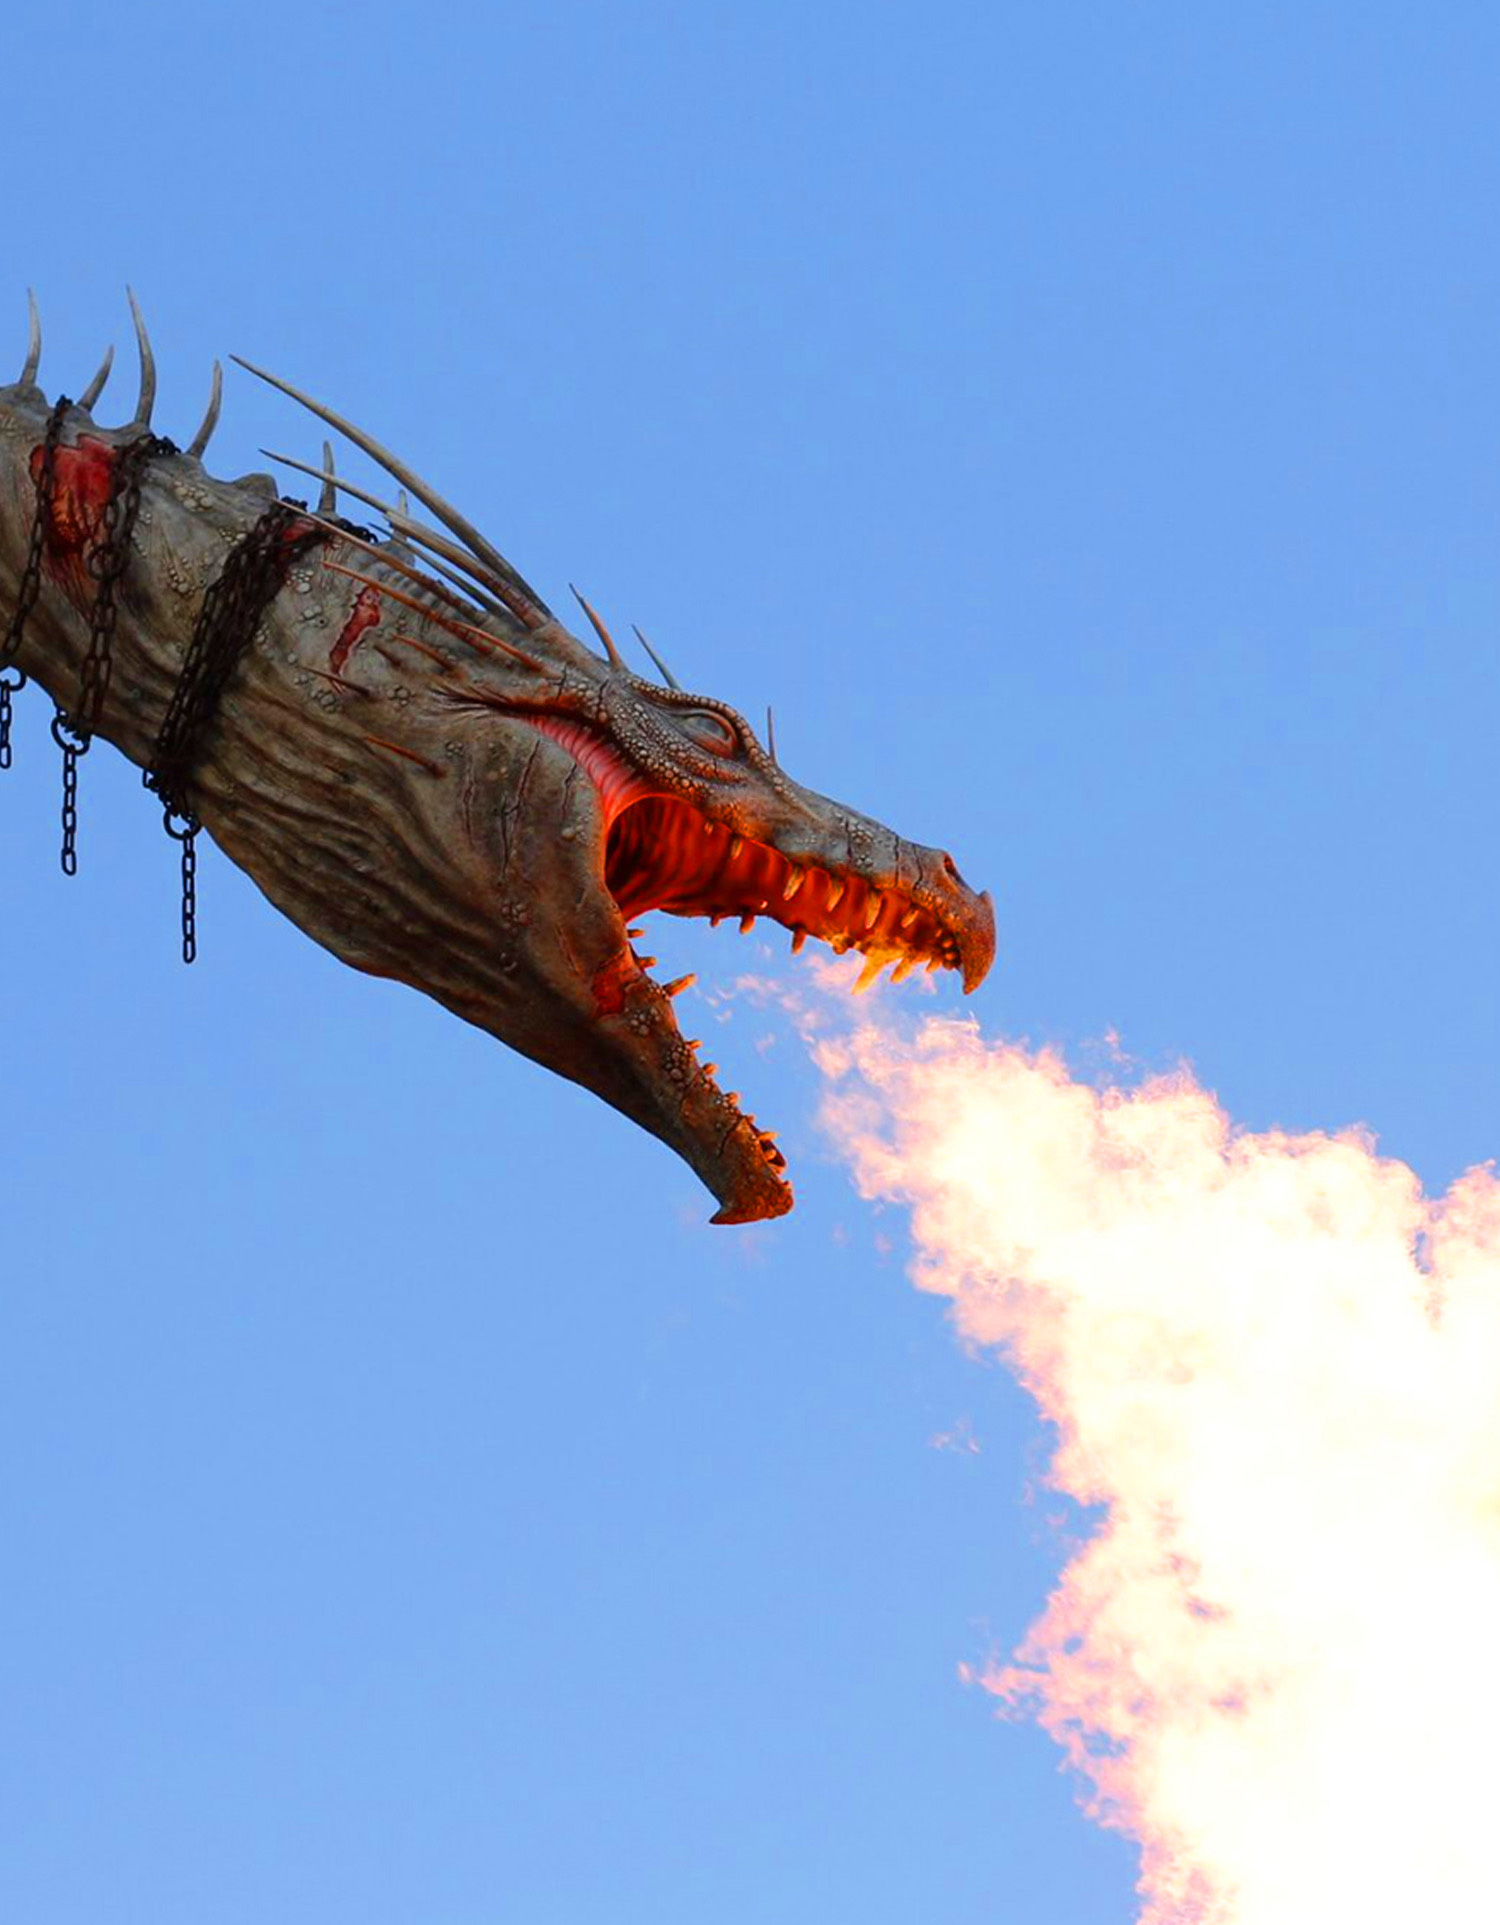 Fire Breathing White Dragon